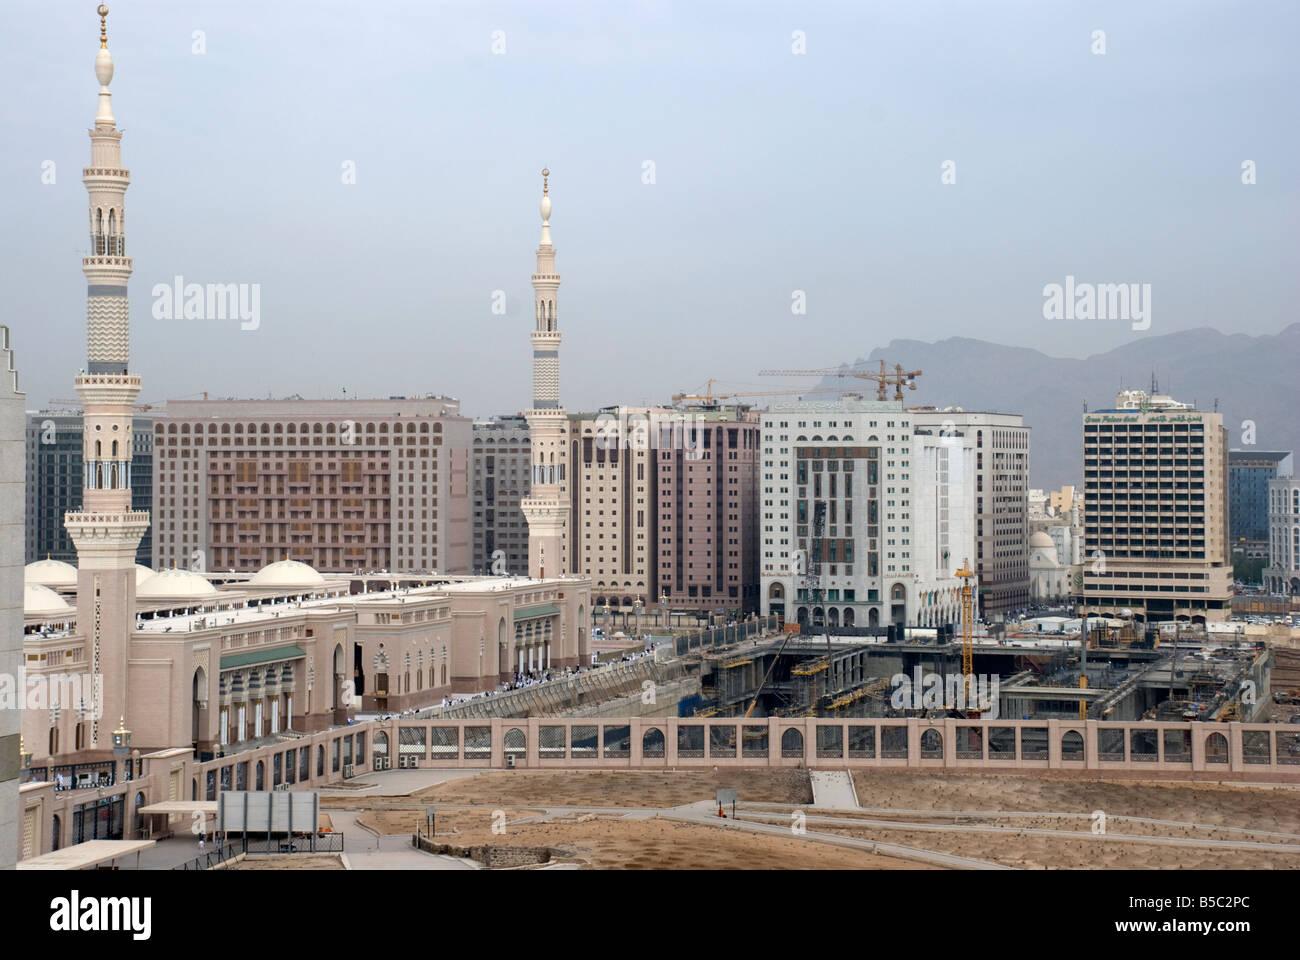 Jannat ul Baqi graveyard in the foreground Masjid al Nabawi and two of its minarets to the left Madinah Saudi Arabia - Stock Image